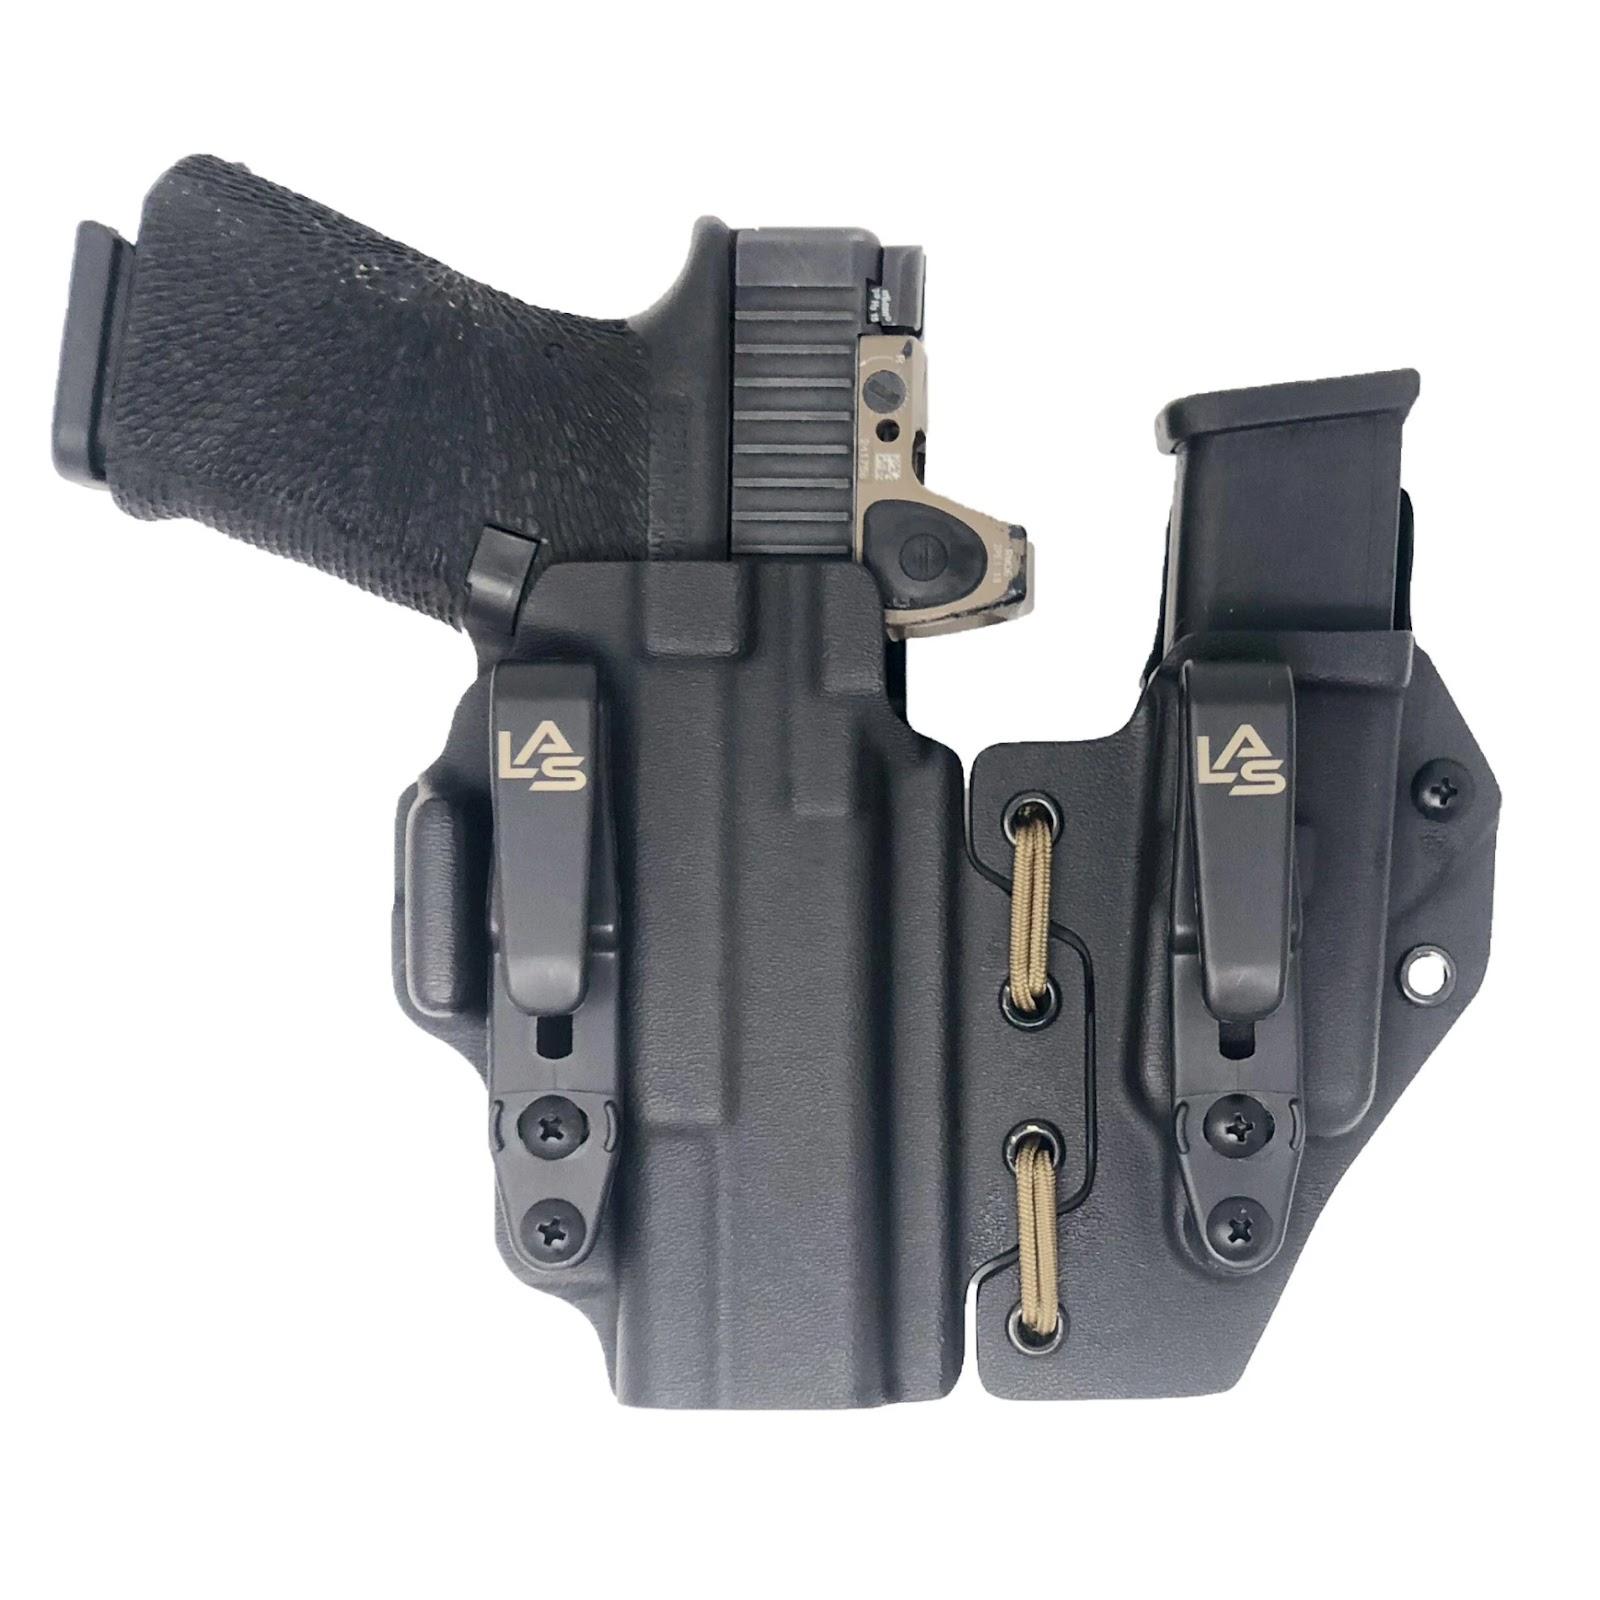 LAS Concealment Ronin 3.0 glock iwb holster